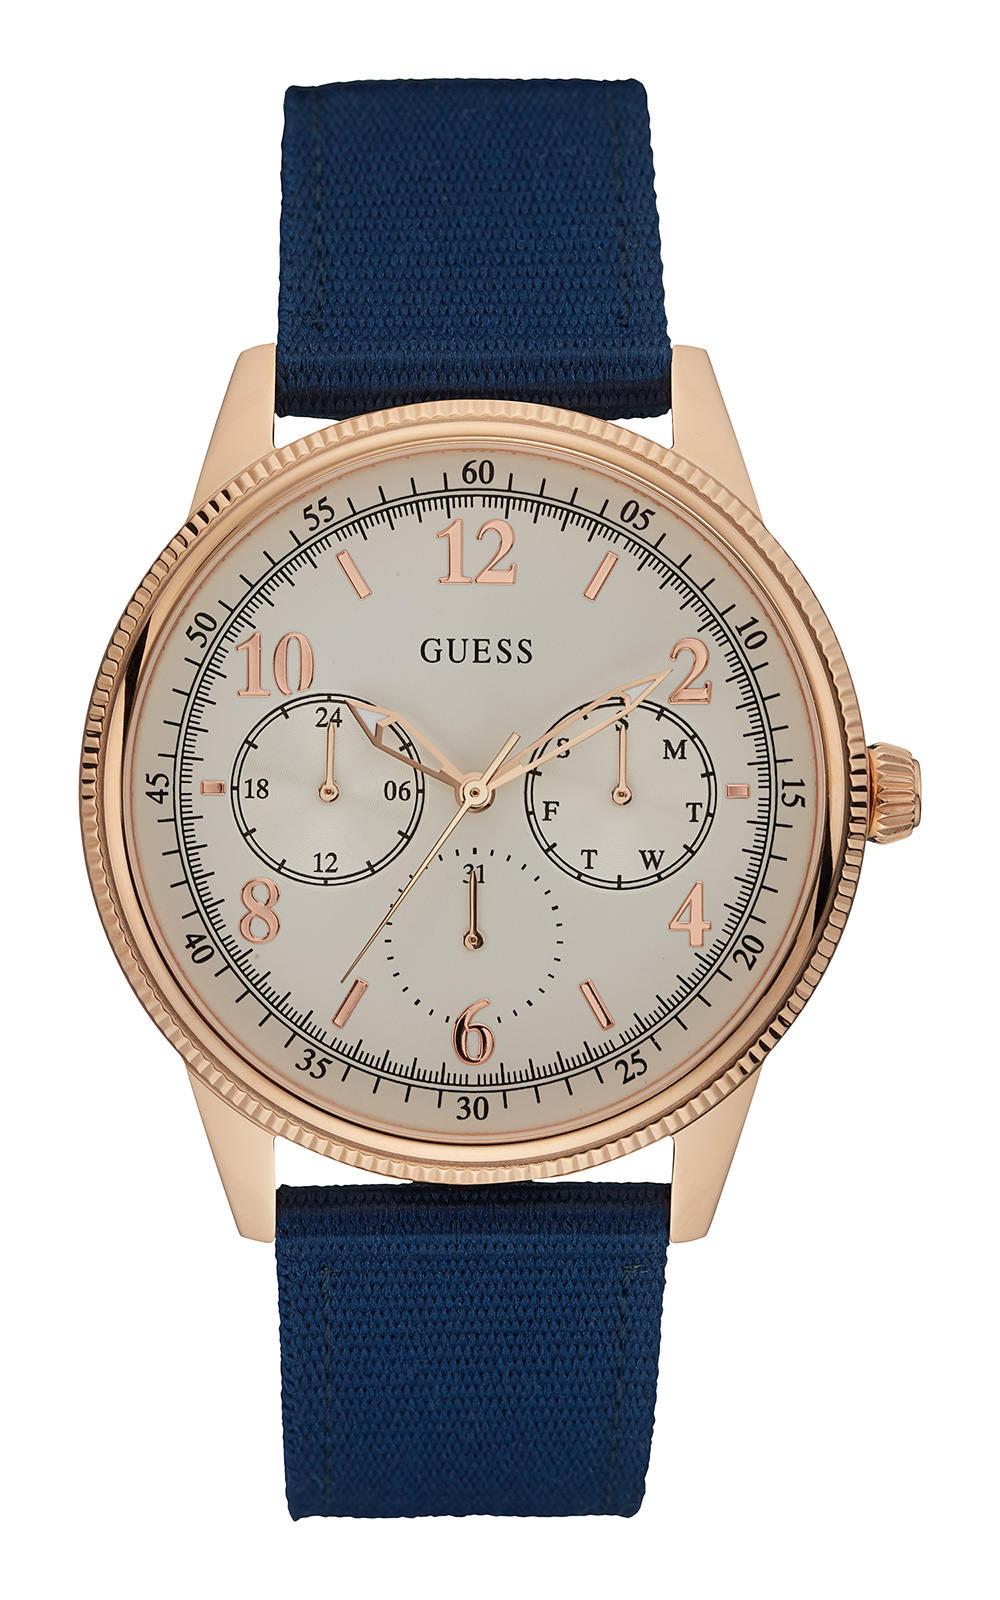 GUESS W0863G4 Ανδρικό Ρολόι Quartz Multi-Function